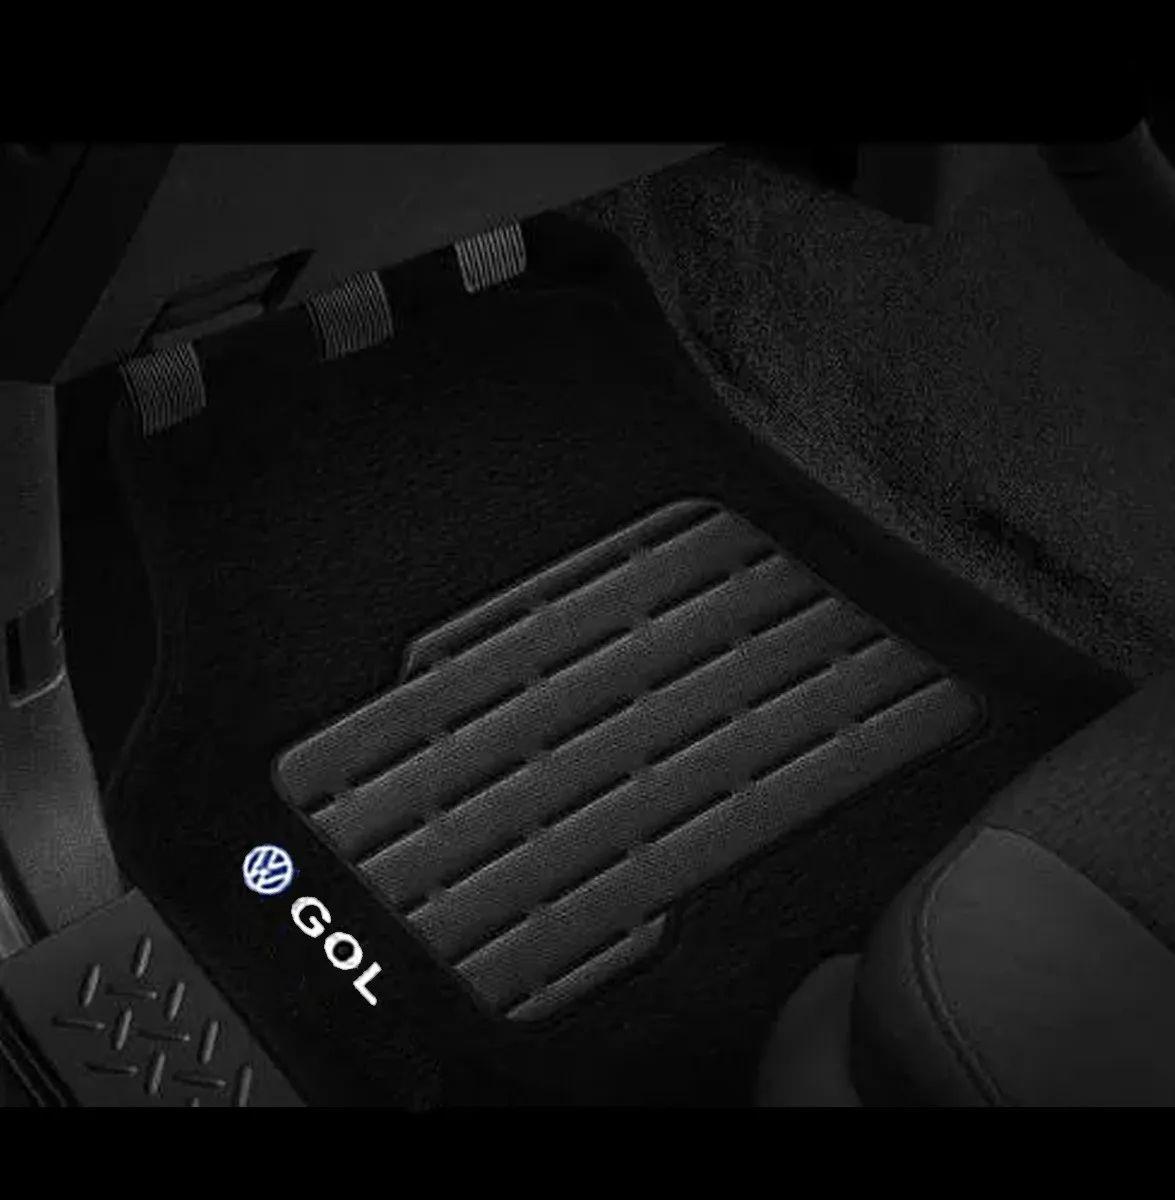 Tapete Carpete Volkswagen Gol G5 G6 Logo Bordado Preto Personalizado Poliparts